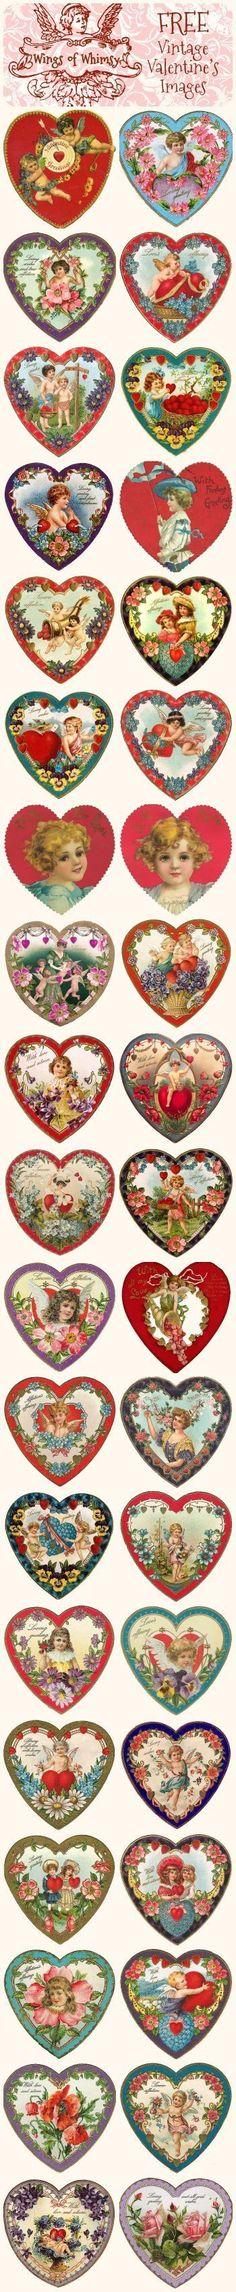 Free Vintage Valentine Images